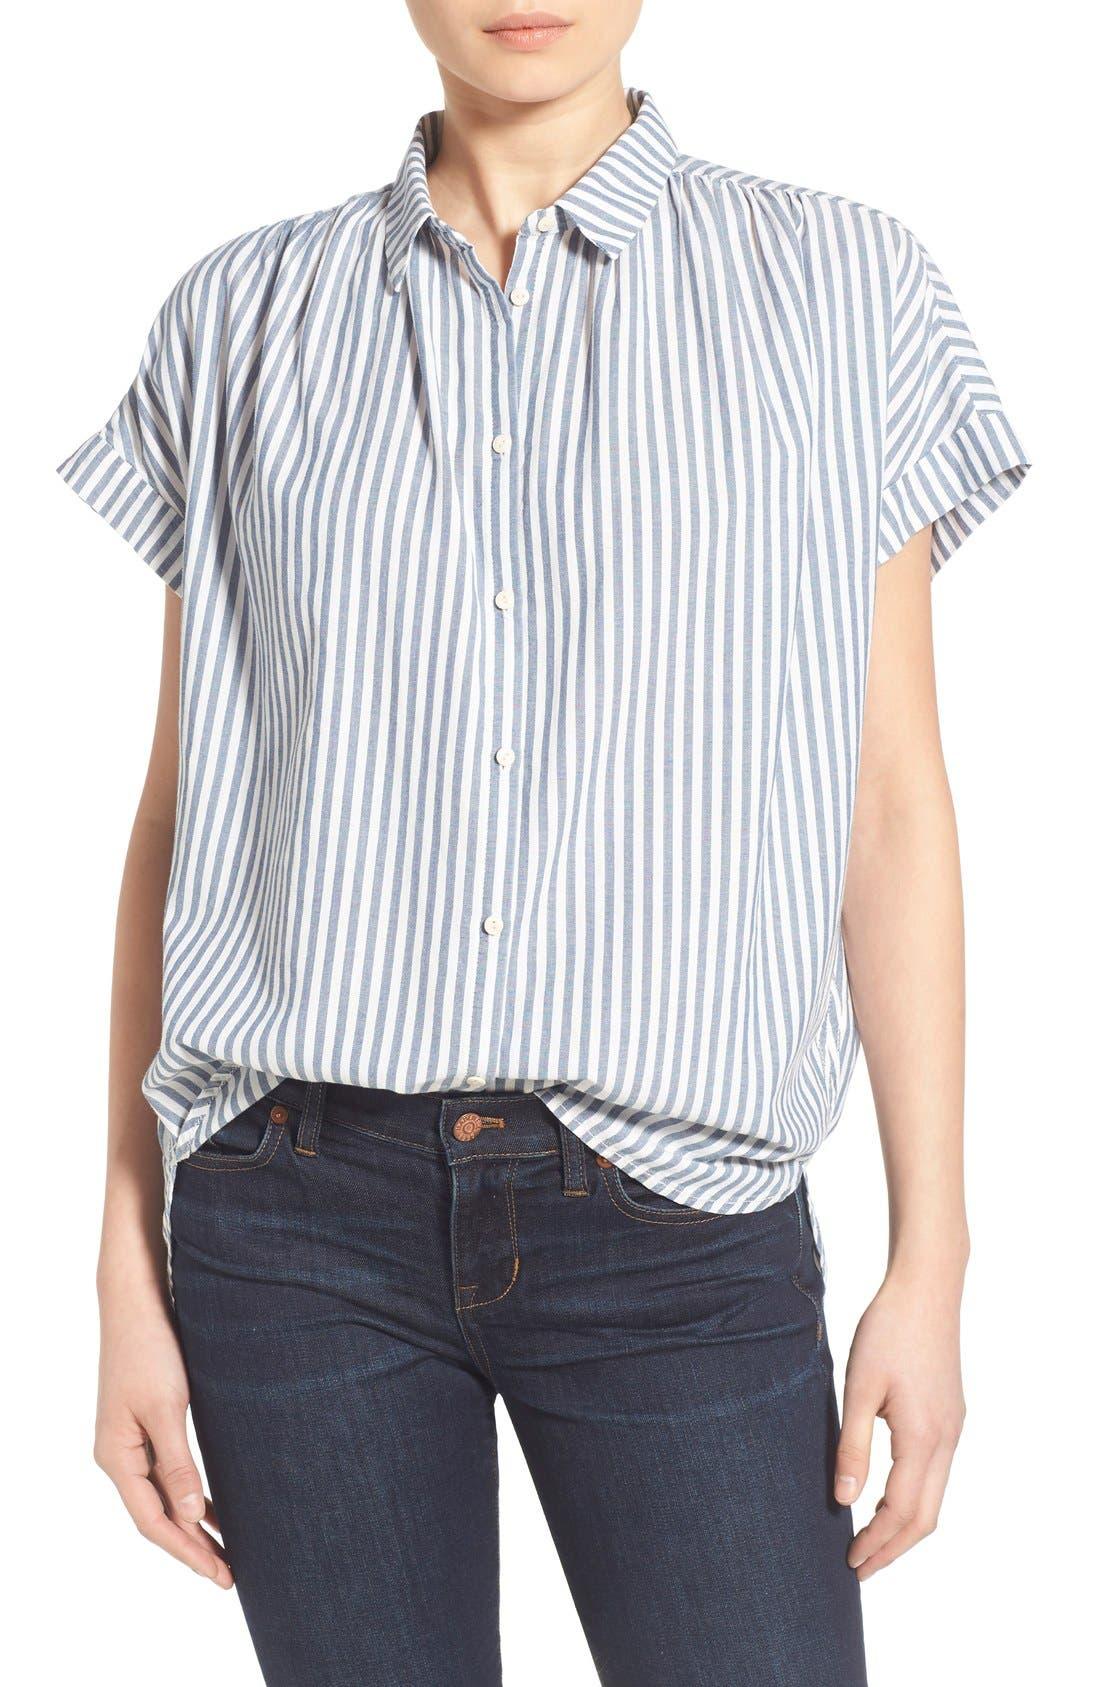 'Central' Stripe Cotton Shirt,                             Main thumbnail 1, color,                             Chambray Stripe